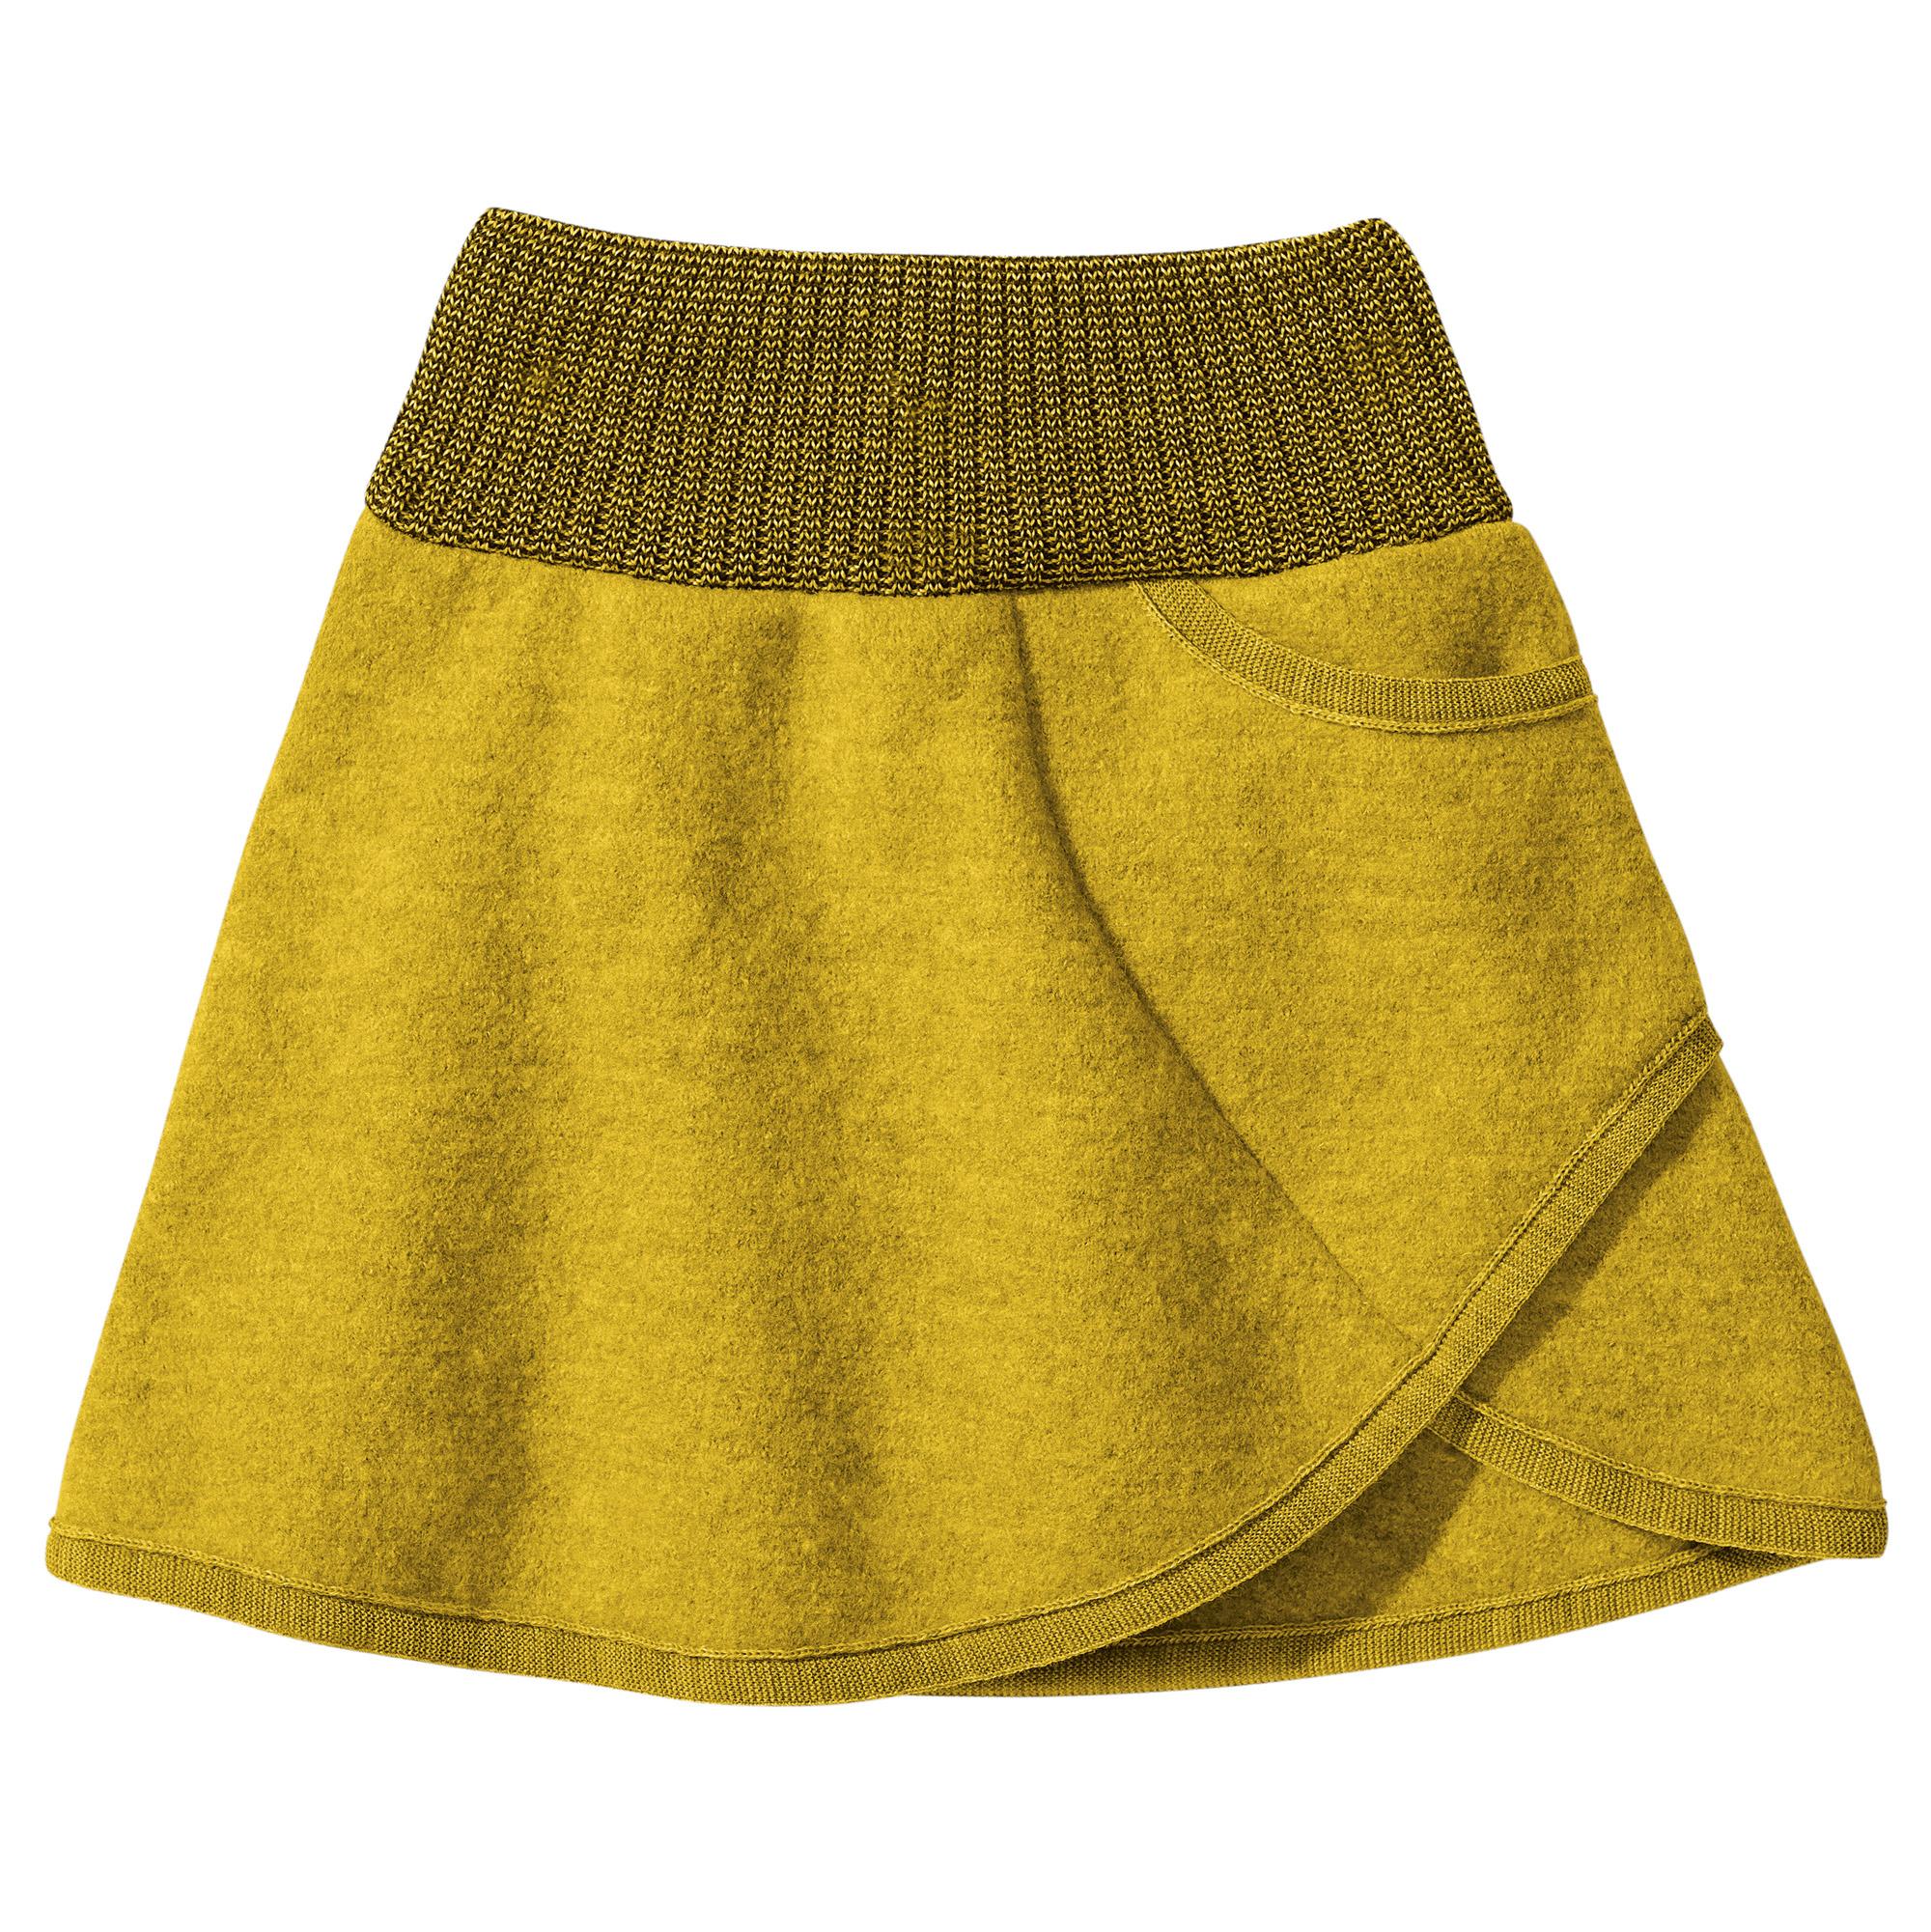 845e7ee6572 DISANA Flaušová sukně merino vlna curry